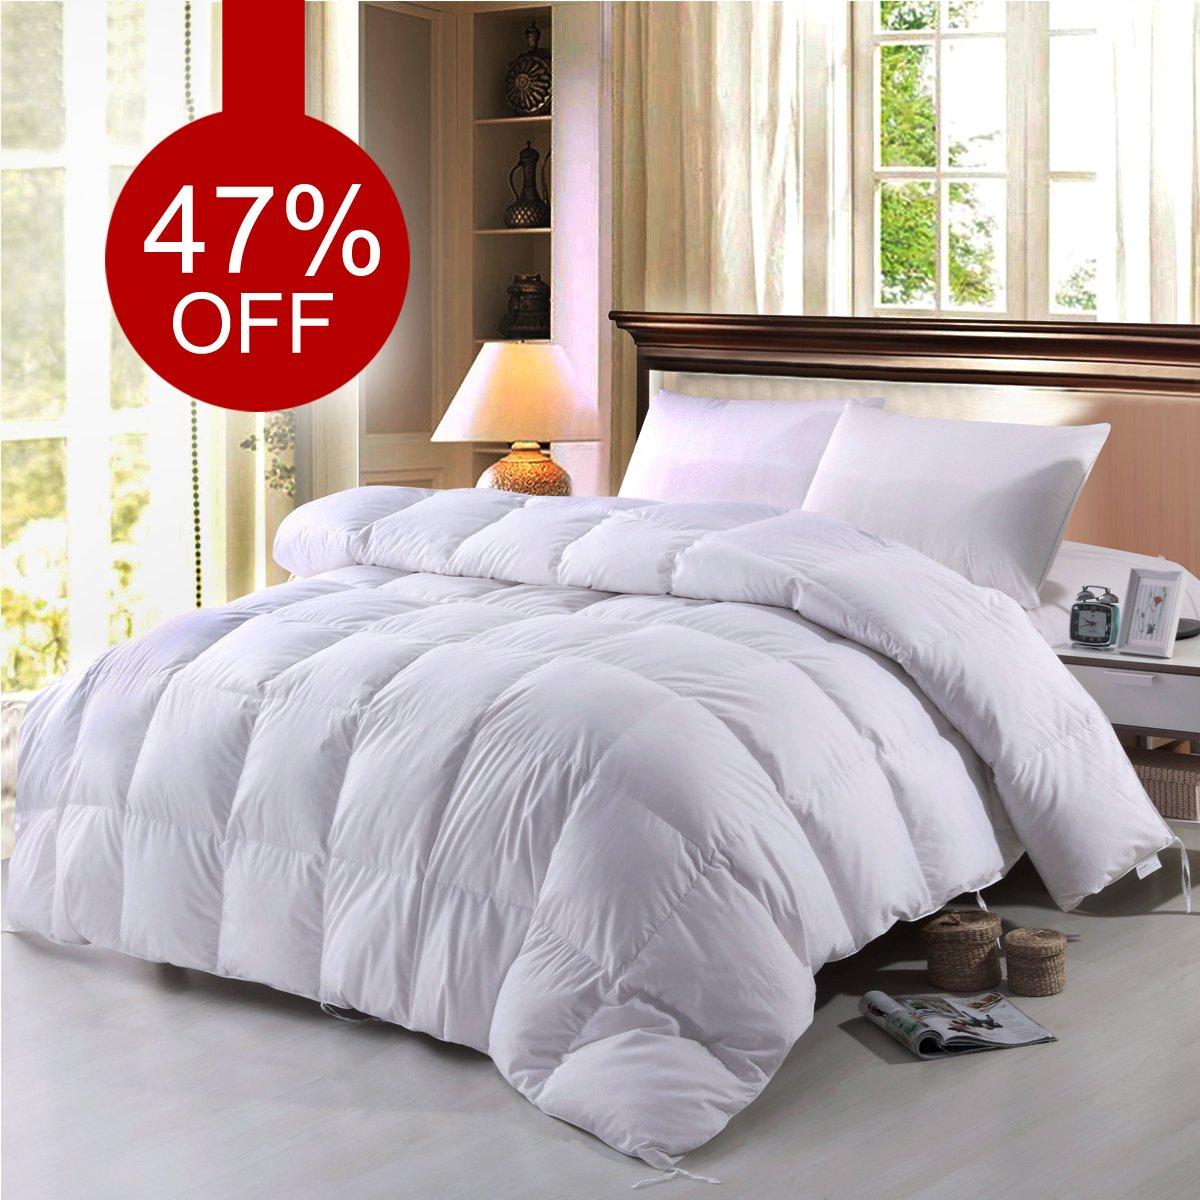 BTWZM Goose Down Comforter, Natural Materials Hypoallergenic Duvet Insert Comforter California King Size, 100% Cotton Down Proof Fabric White Comforter (California King)